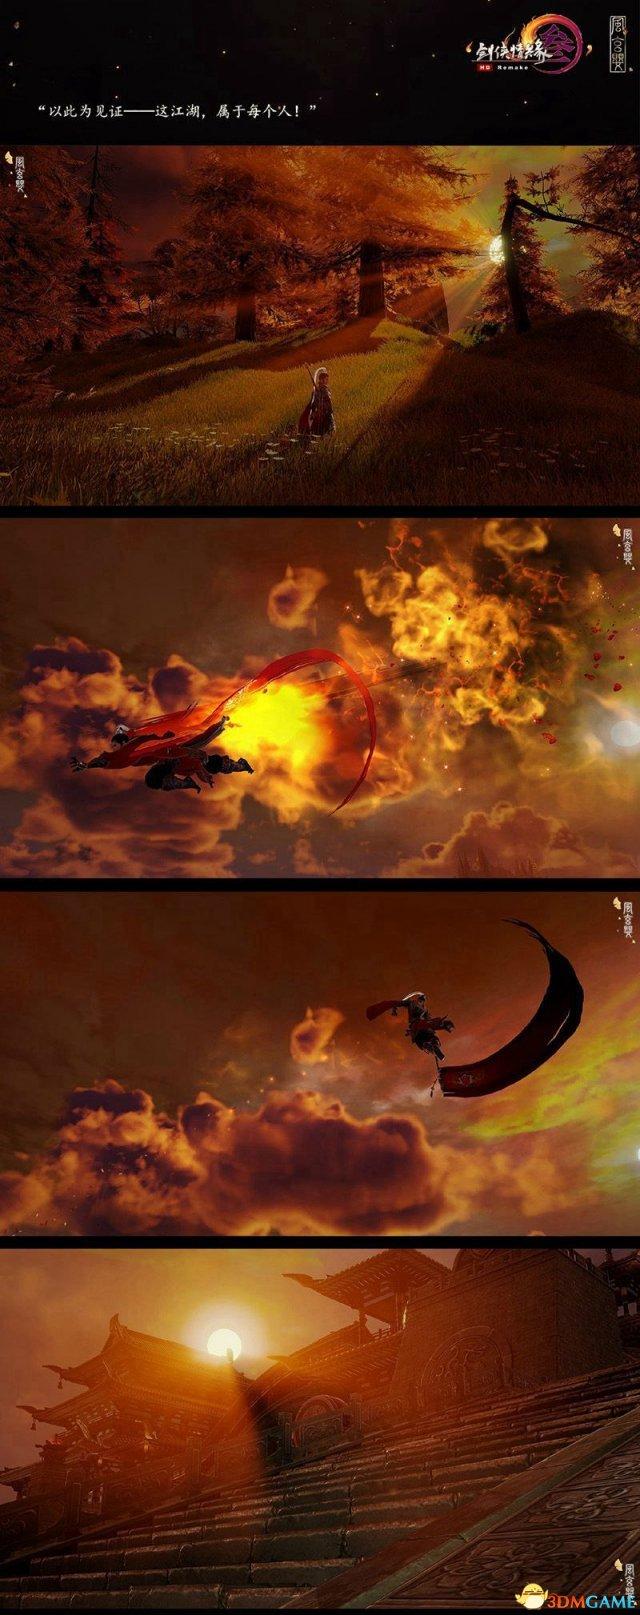 <b>大美江湖 《剑网3》重制版有爱玩家截图赏</b>